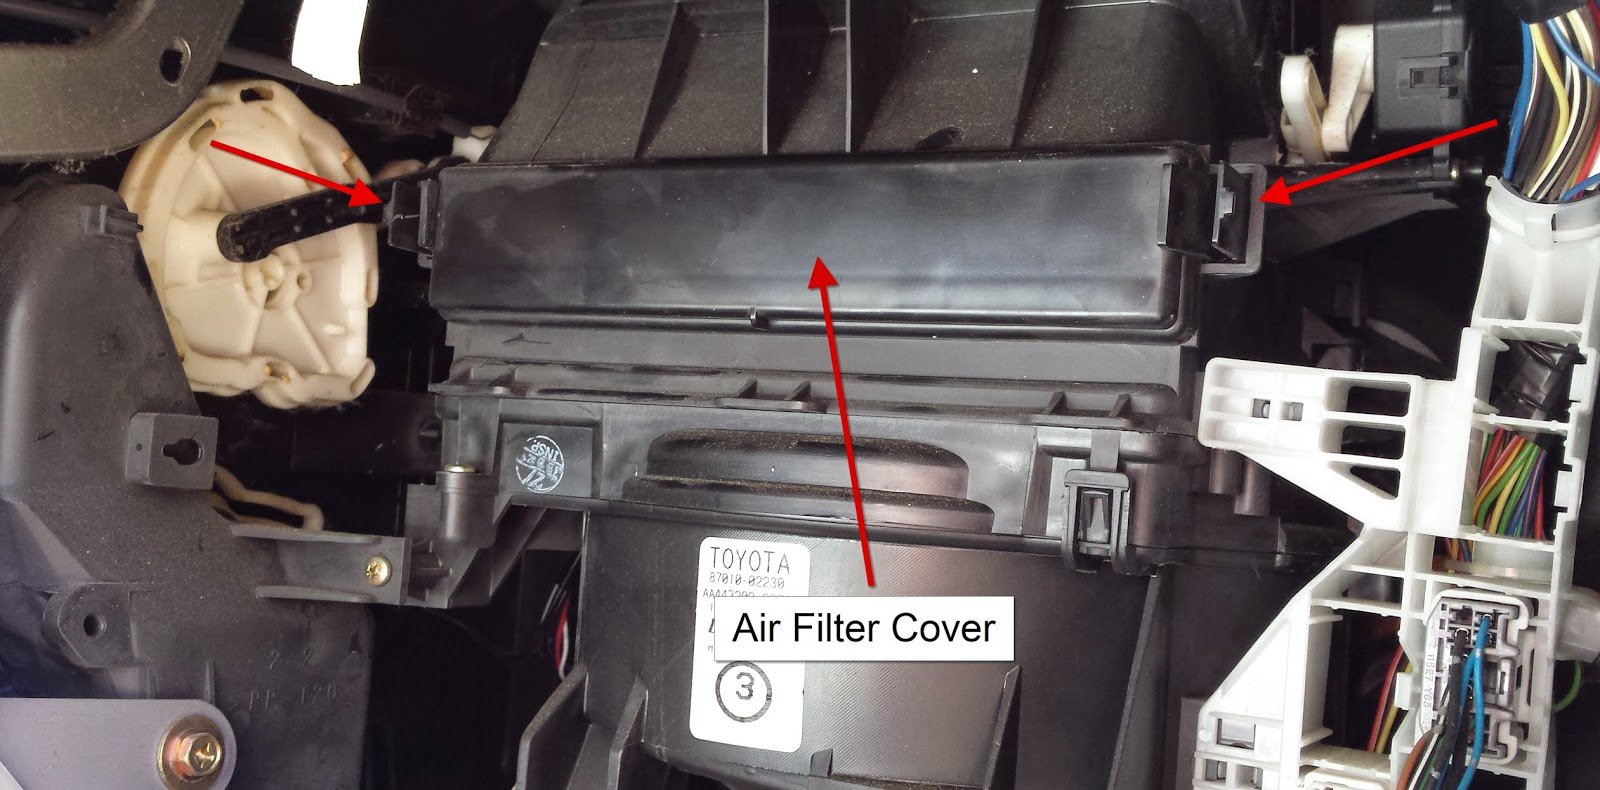 Toyota Matrix Fuel Filter Location 2005 Corolla Change In Cabin Air Nation Forum 1600x790